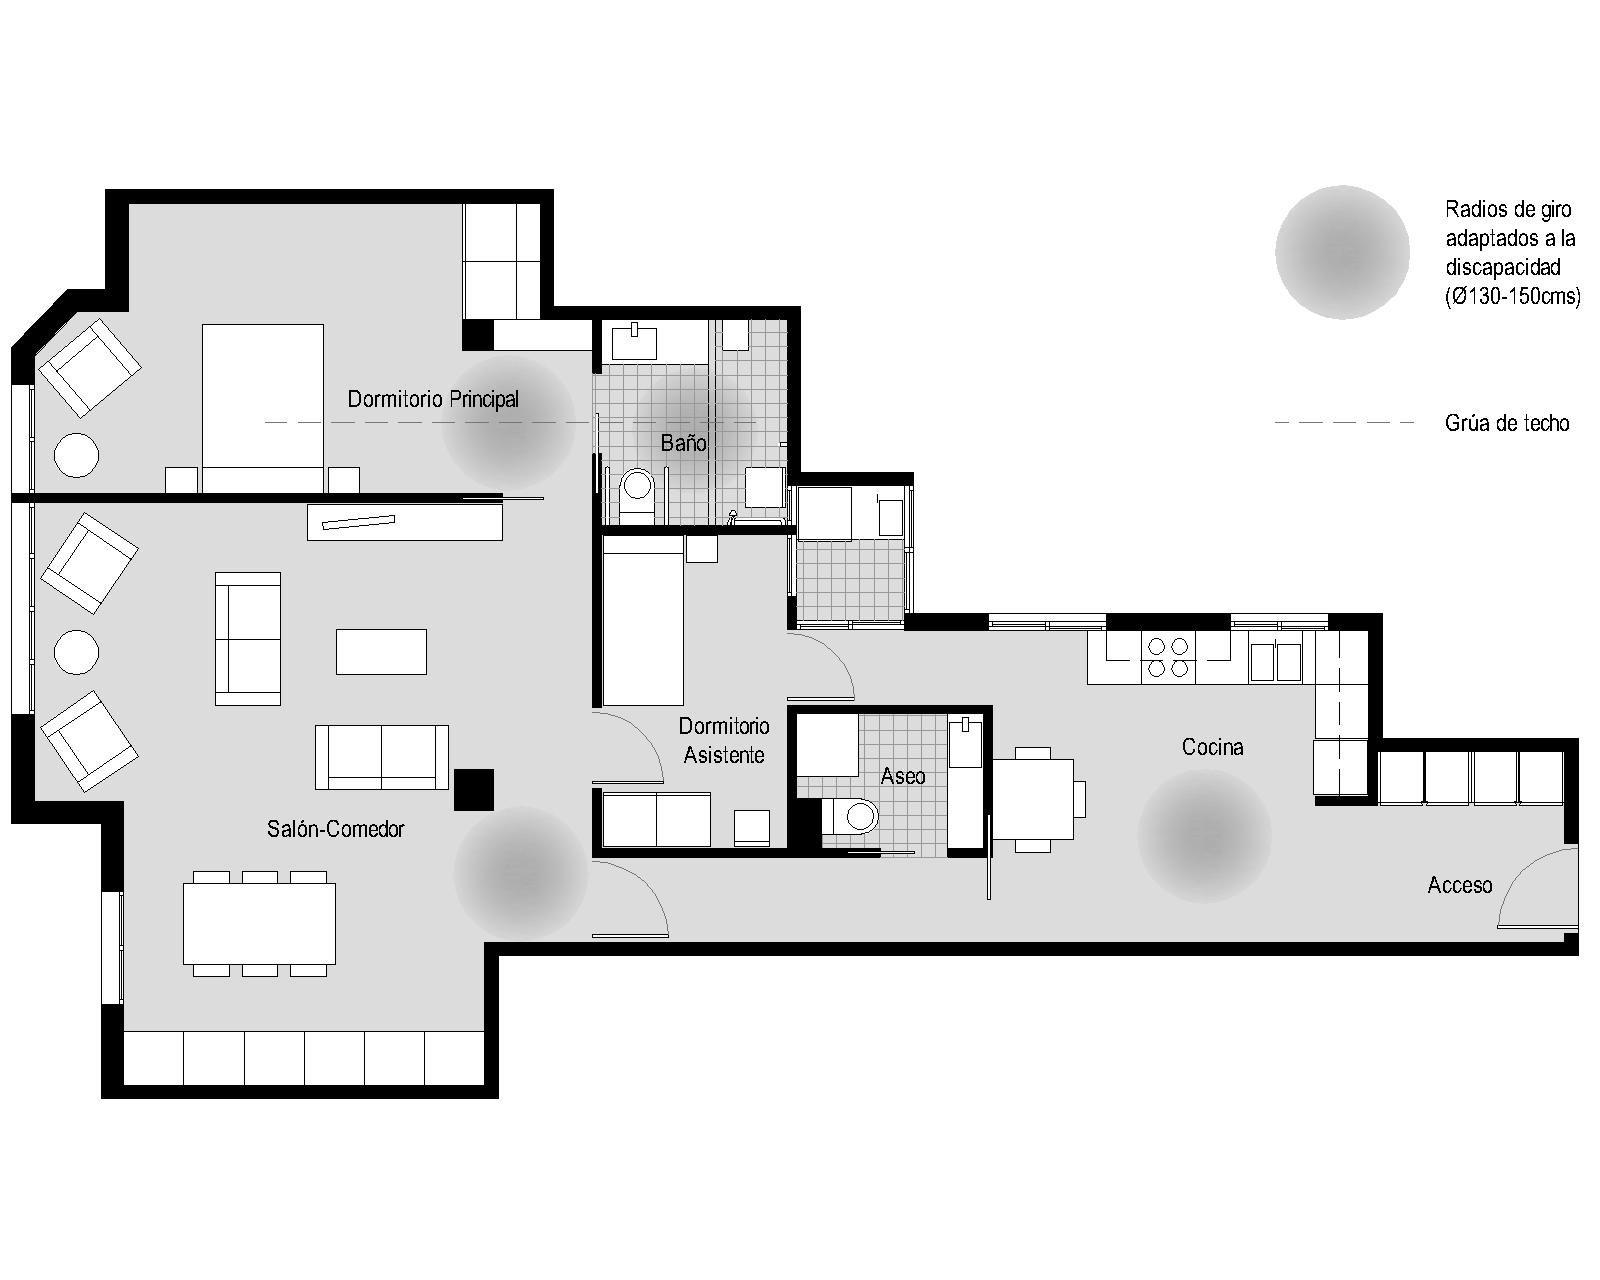 diseno de baño para discapacitados:vivienda parkinson arquitectura ... - Aseo Adaptado A Minusvalidos Medidas